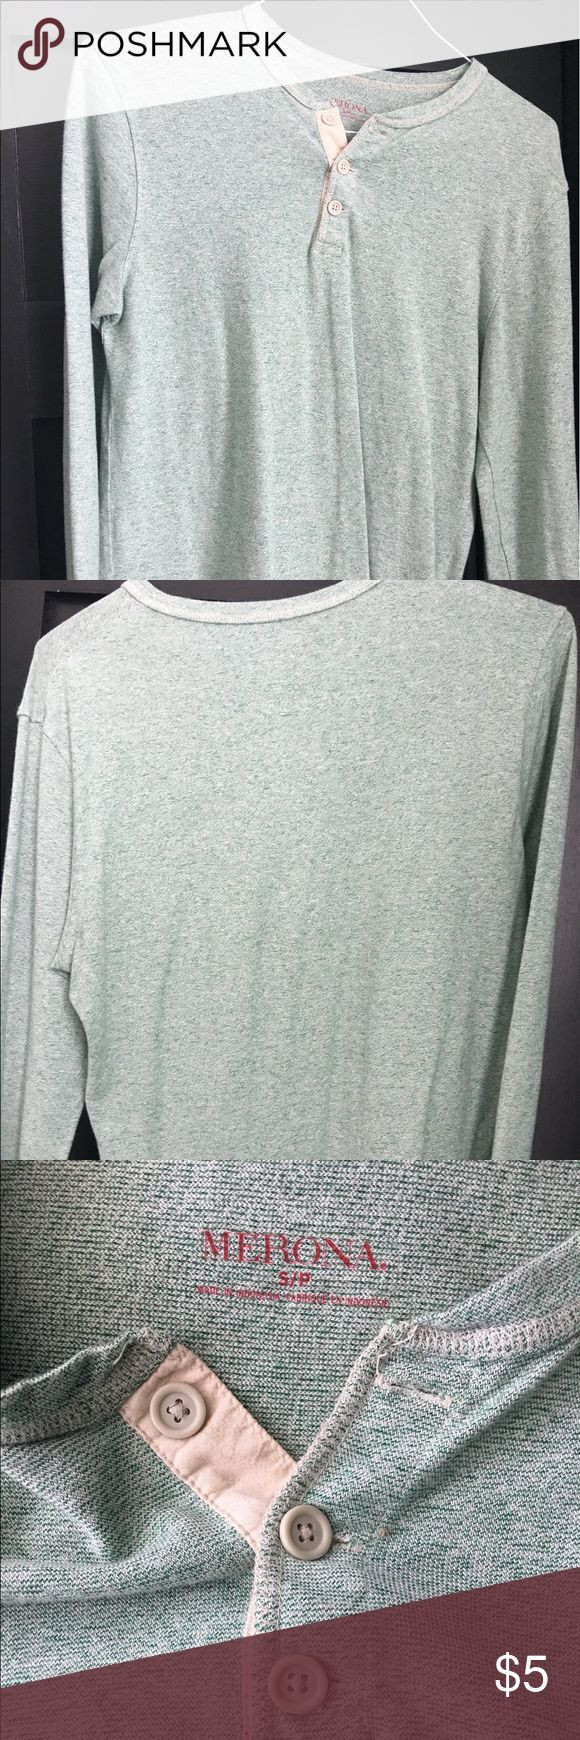 Merona pale green men's Henley tee Thin material, pale green Henley tee shirt. Slim fit. Merona Shirts Tees - Long Sleeve